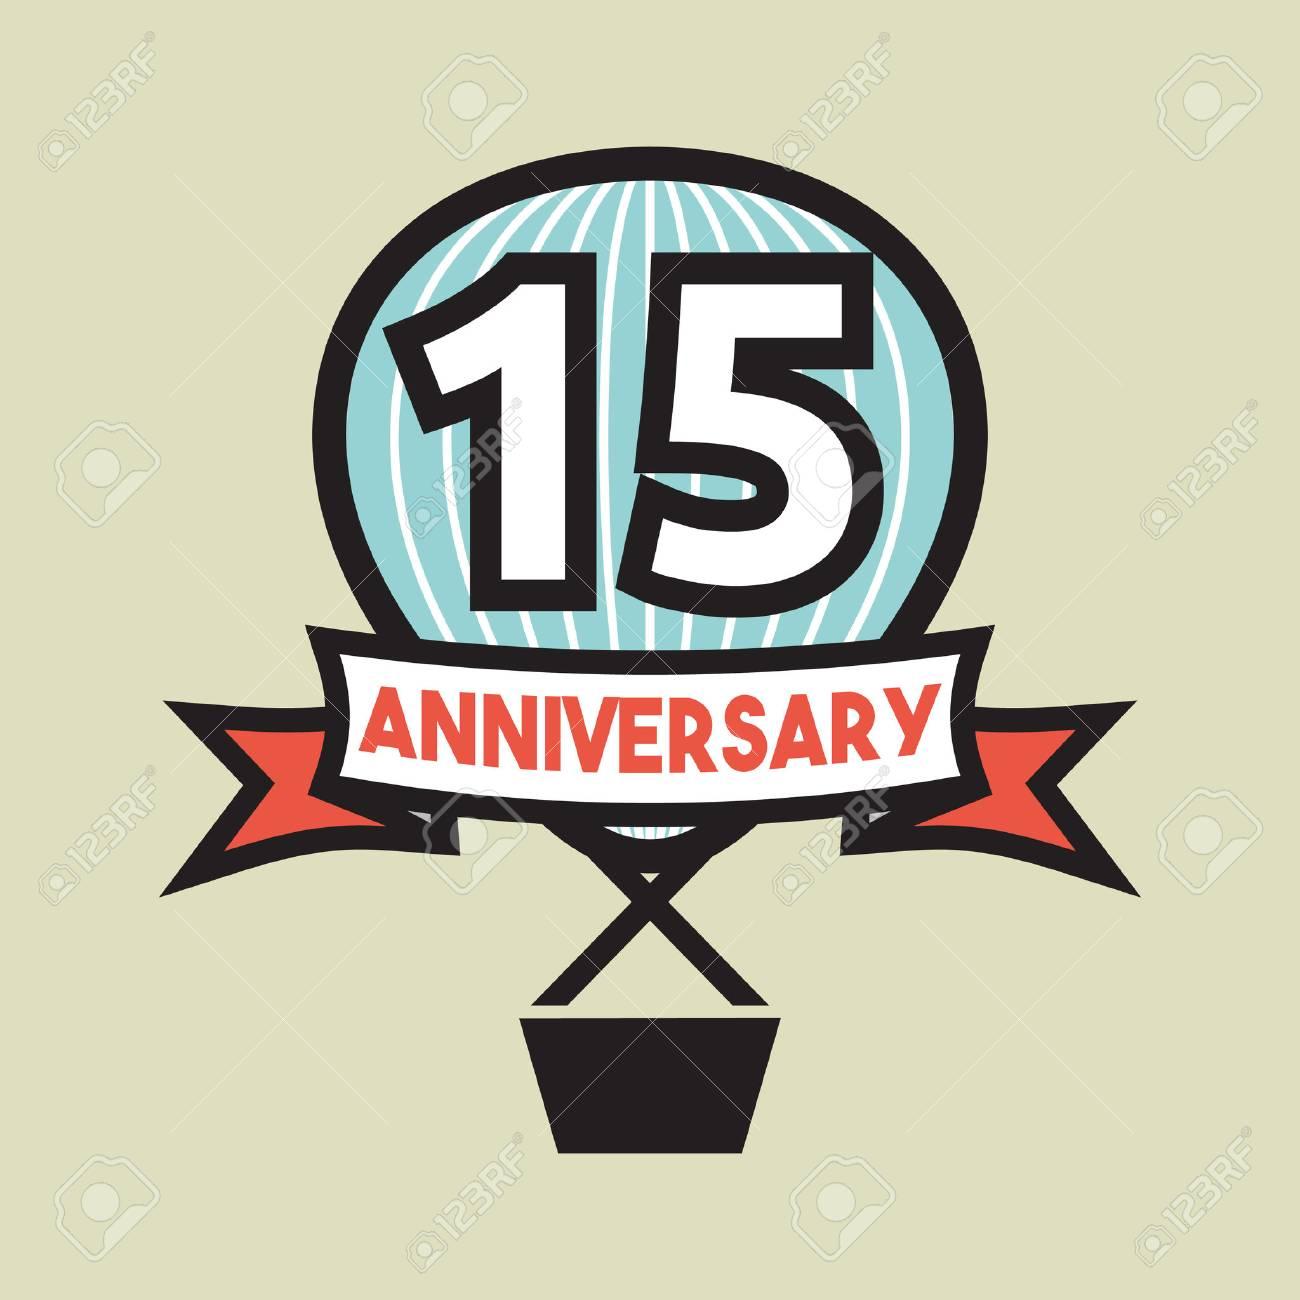 15 Years Anniversary Balloon Royalty Free Cliparts Vectors And